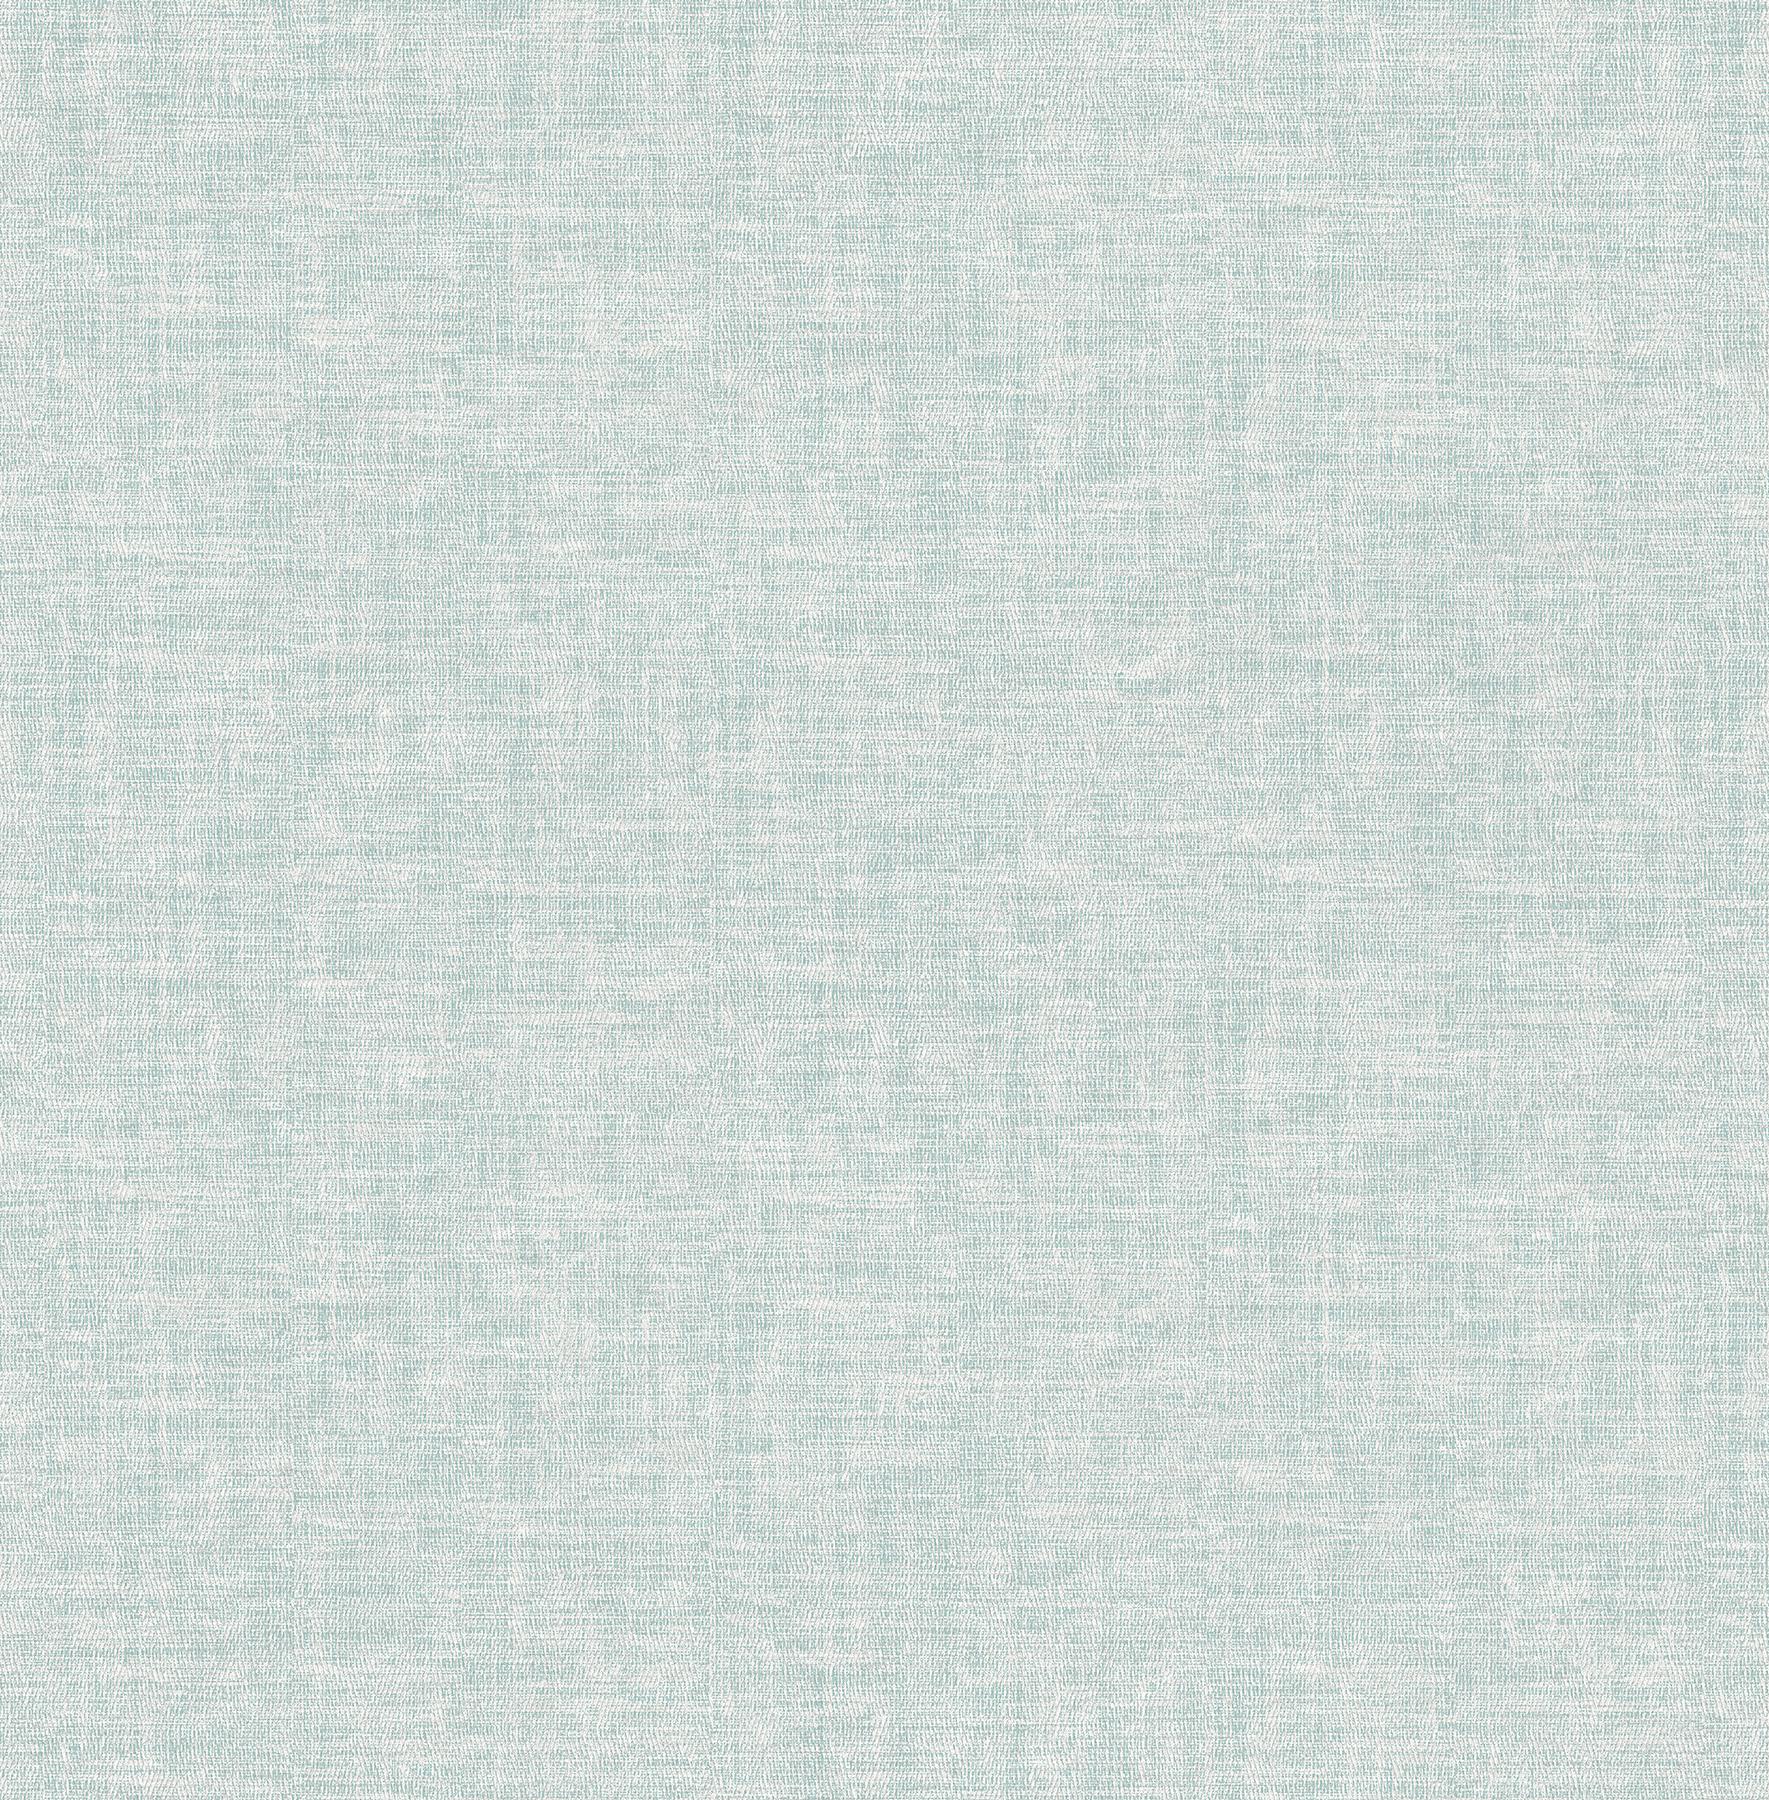 Picture of Azmaara Teal Texture Wallpaper